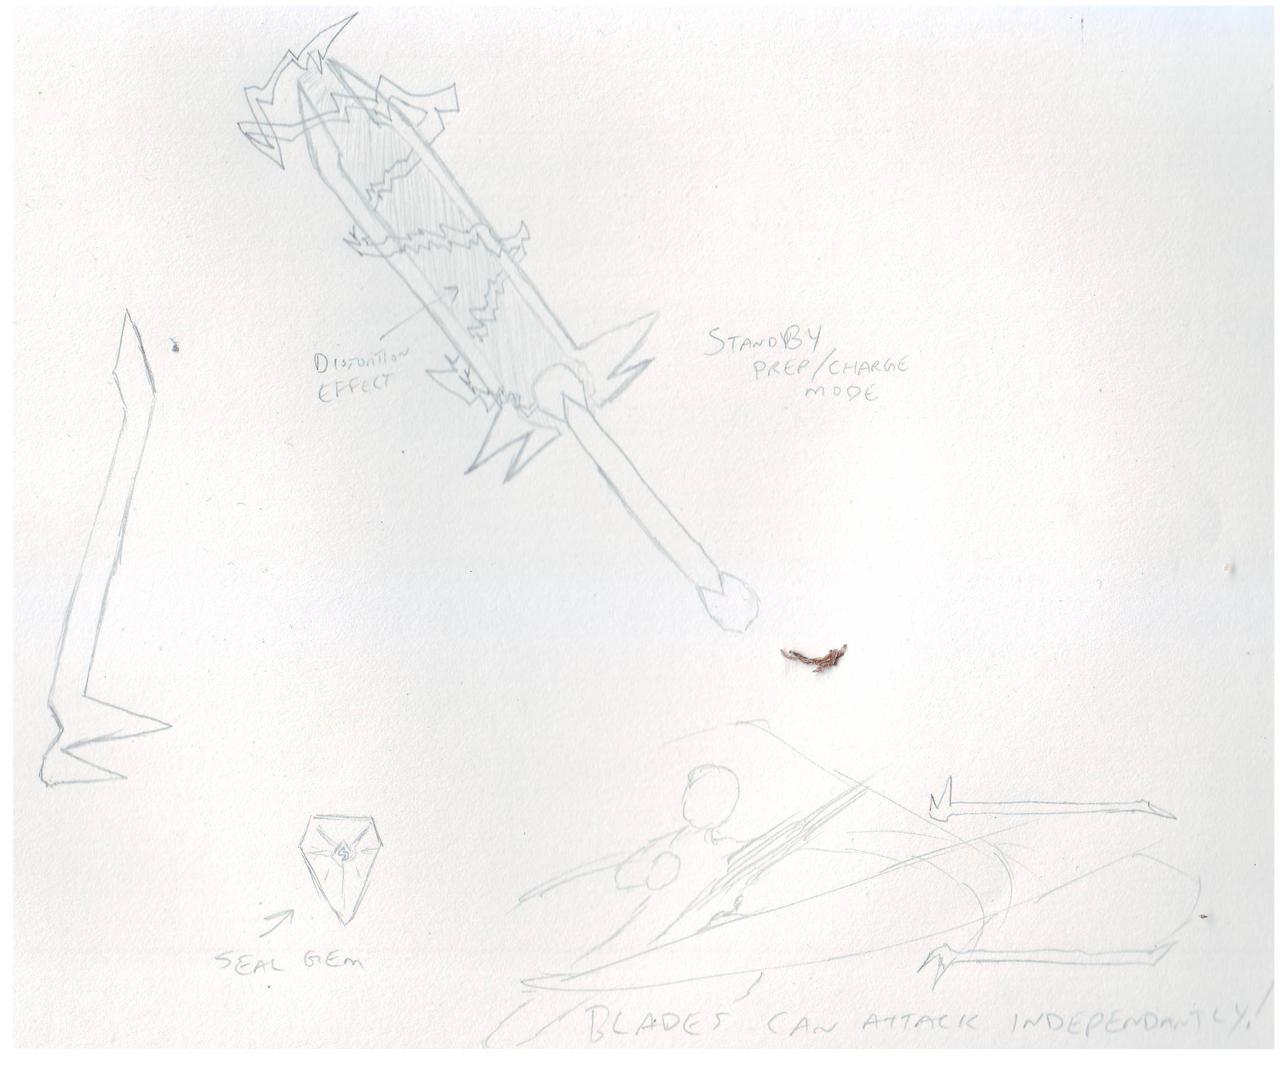 Diver concept 4 by Densuo